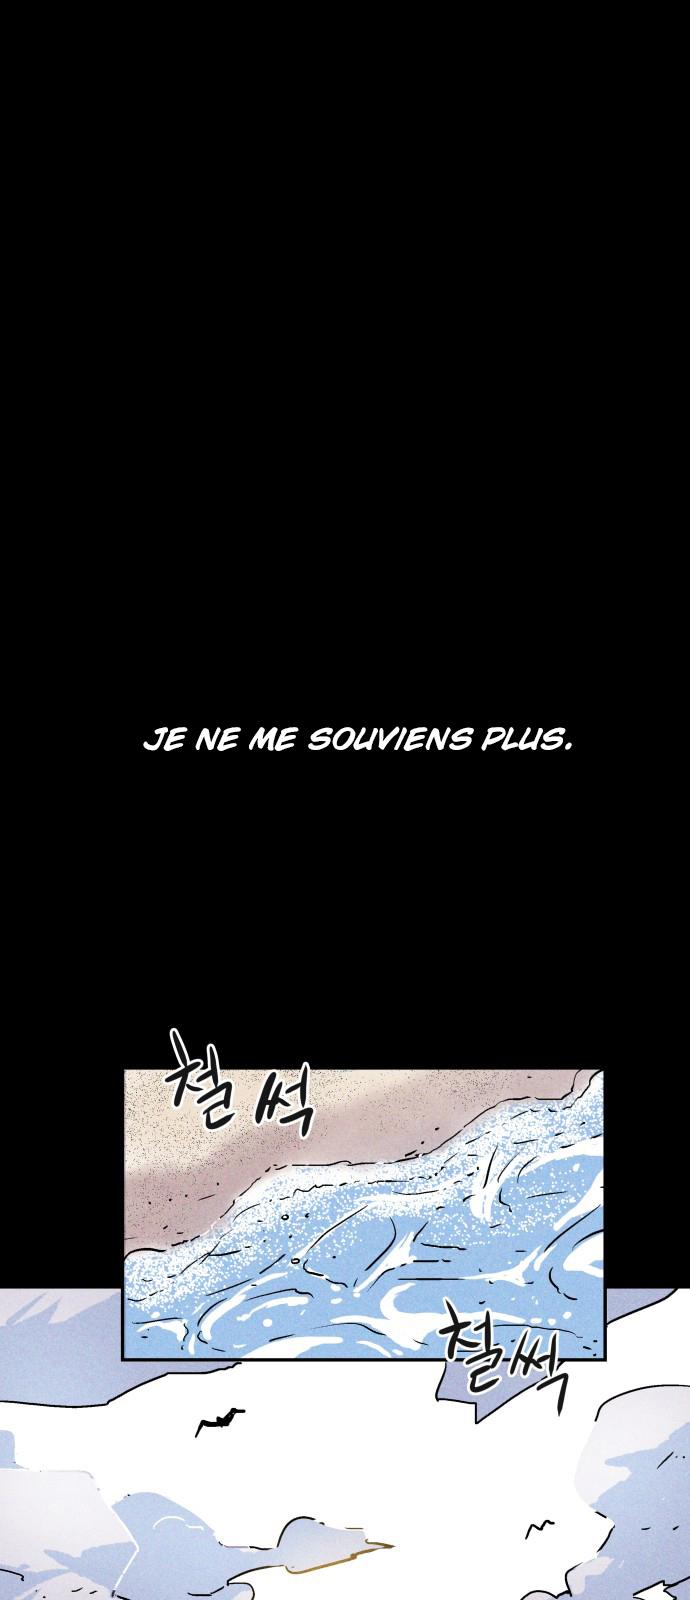 https://nine.mangadogs.com/fr_manga/pic2/4/4996/561587/3d86b21e15c3a29f4d87e511fbb95178.jpg Page 1